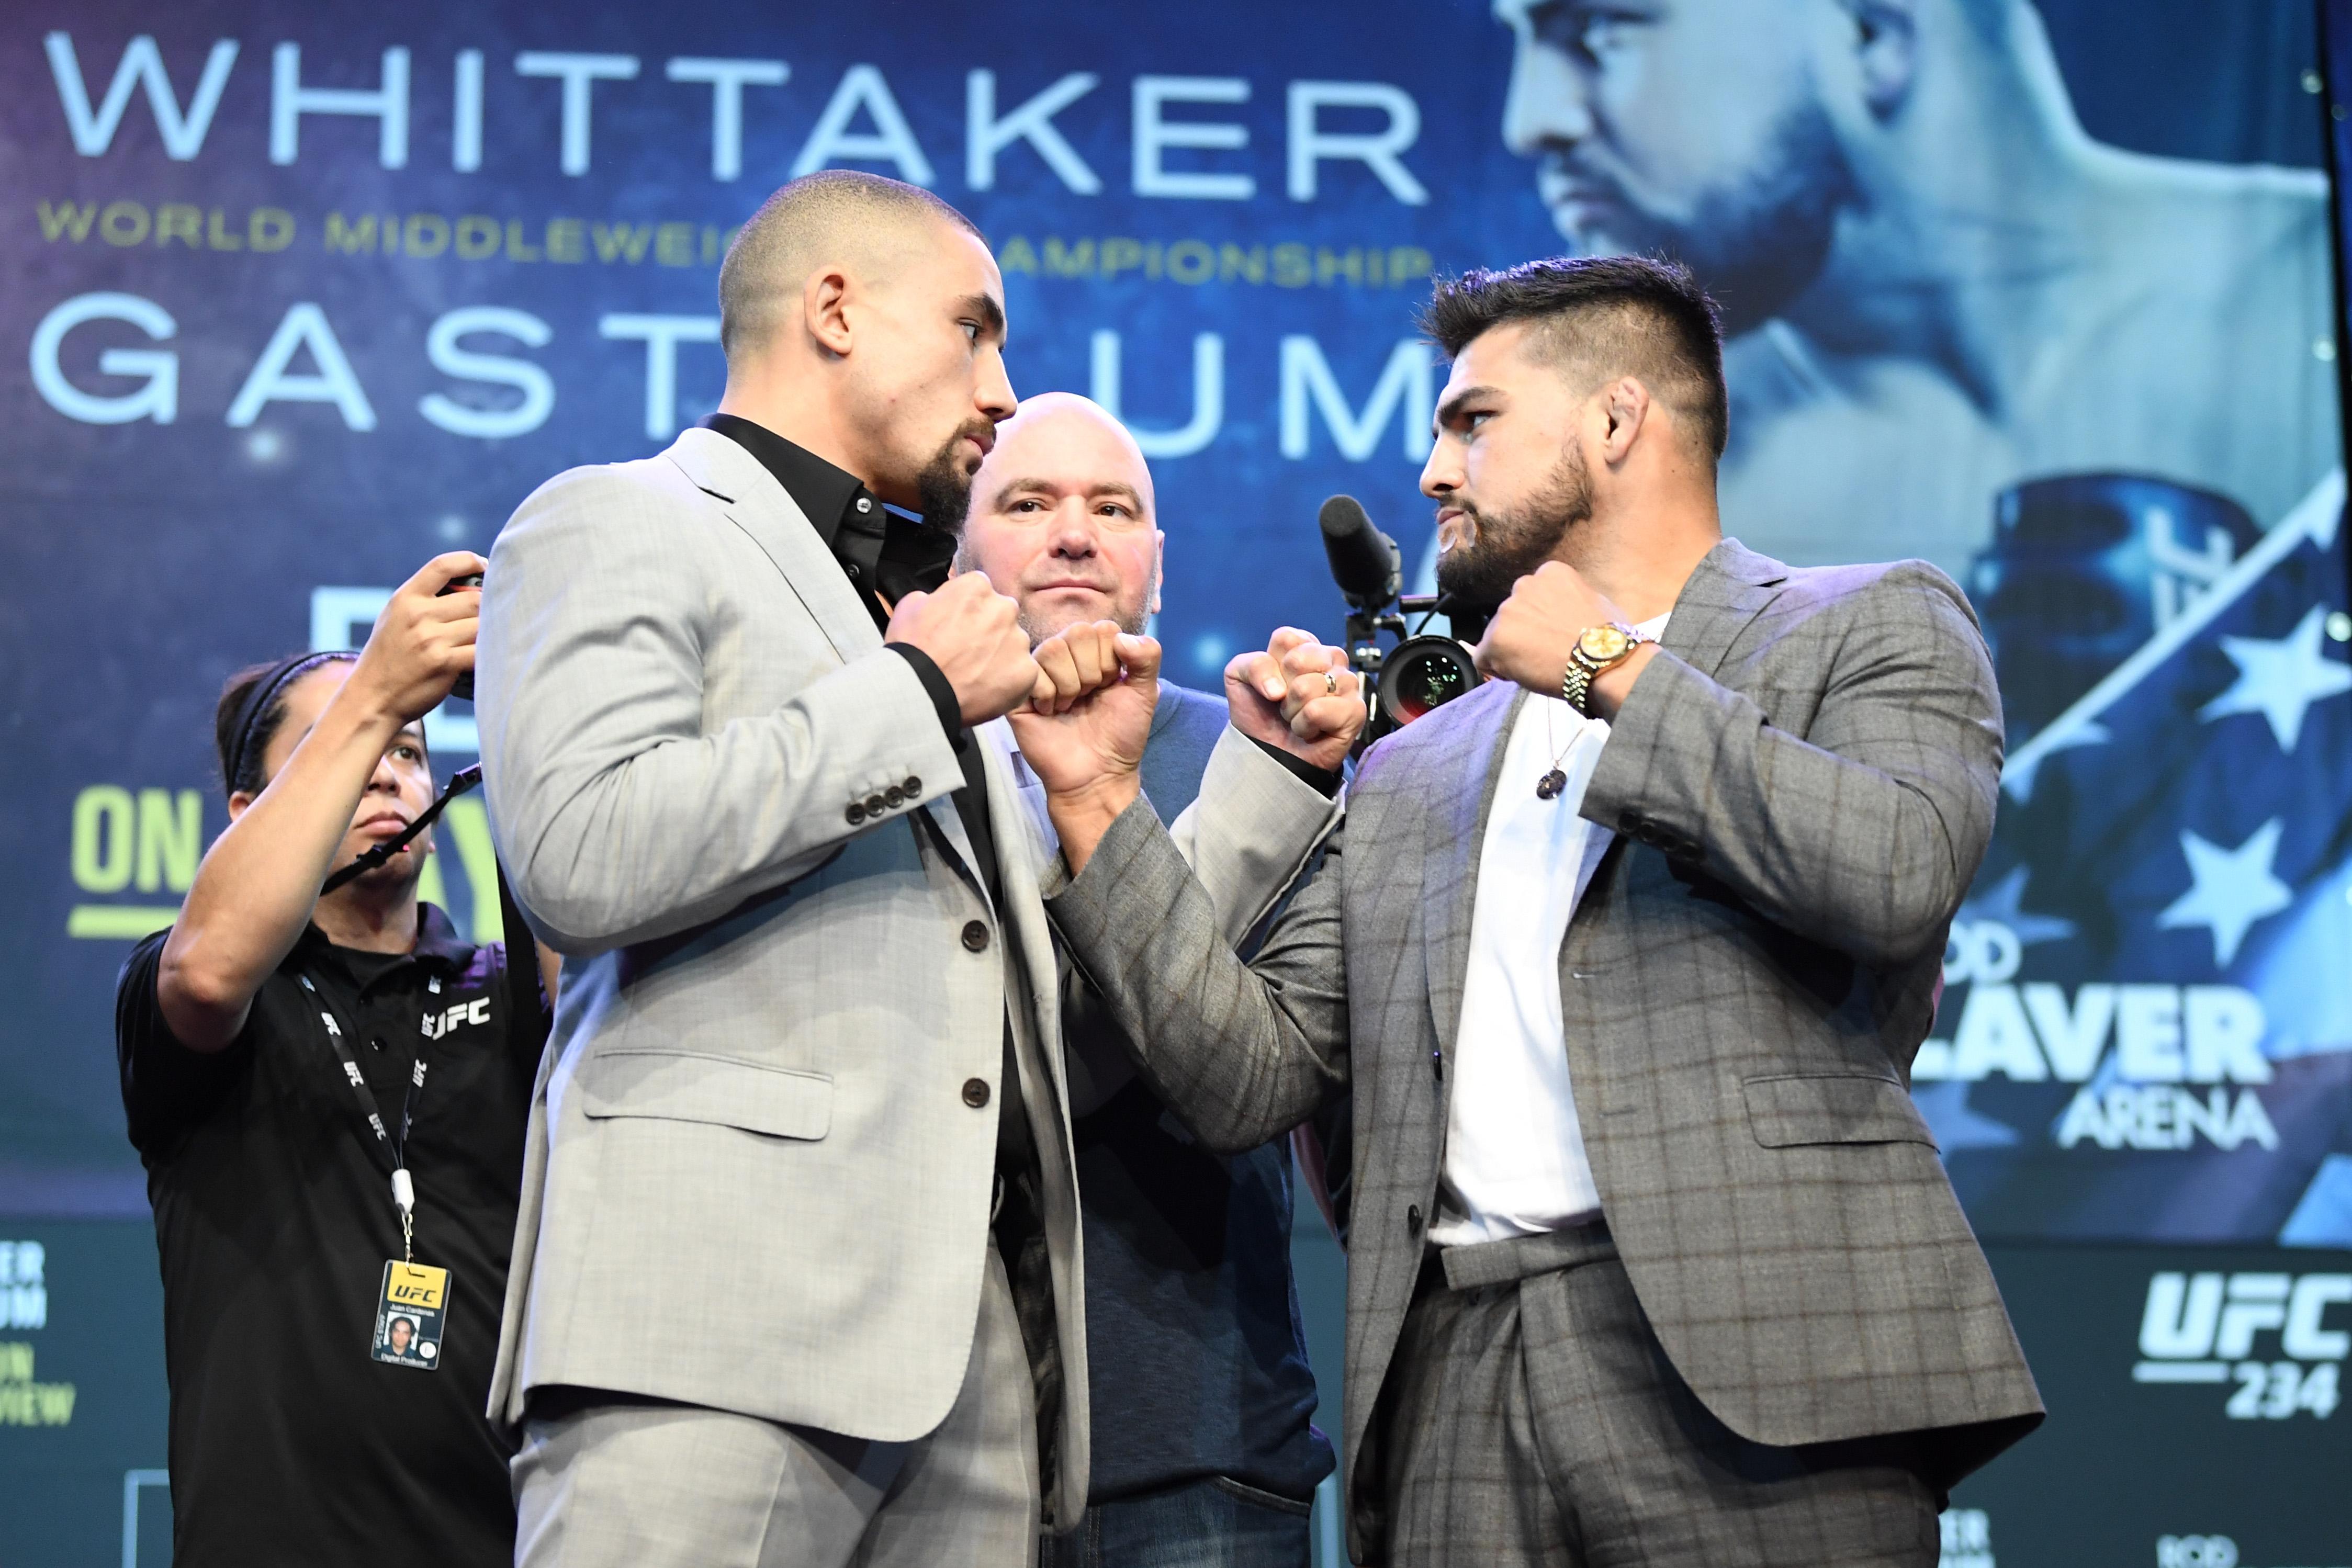 UFC 234 Whittaker v Gastelum: Press Conference